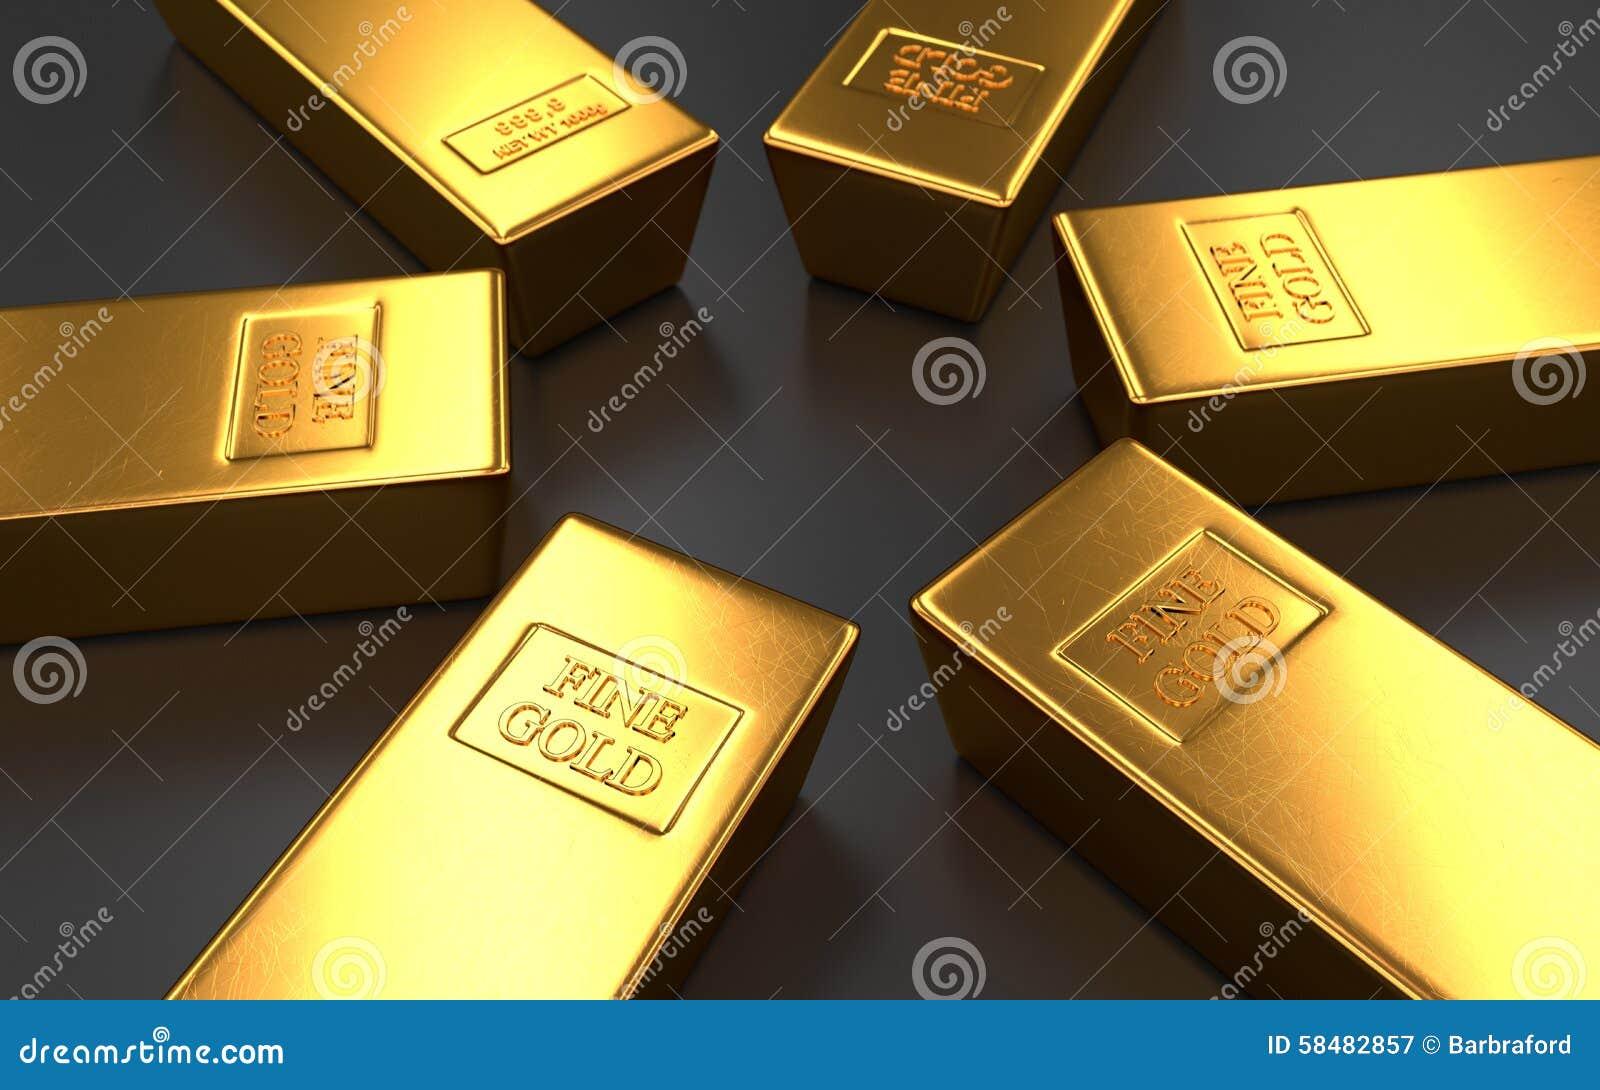 gold bar black background - photo #49